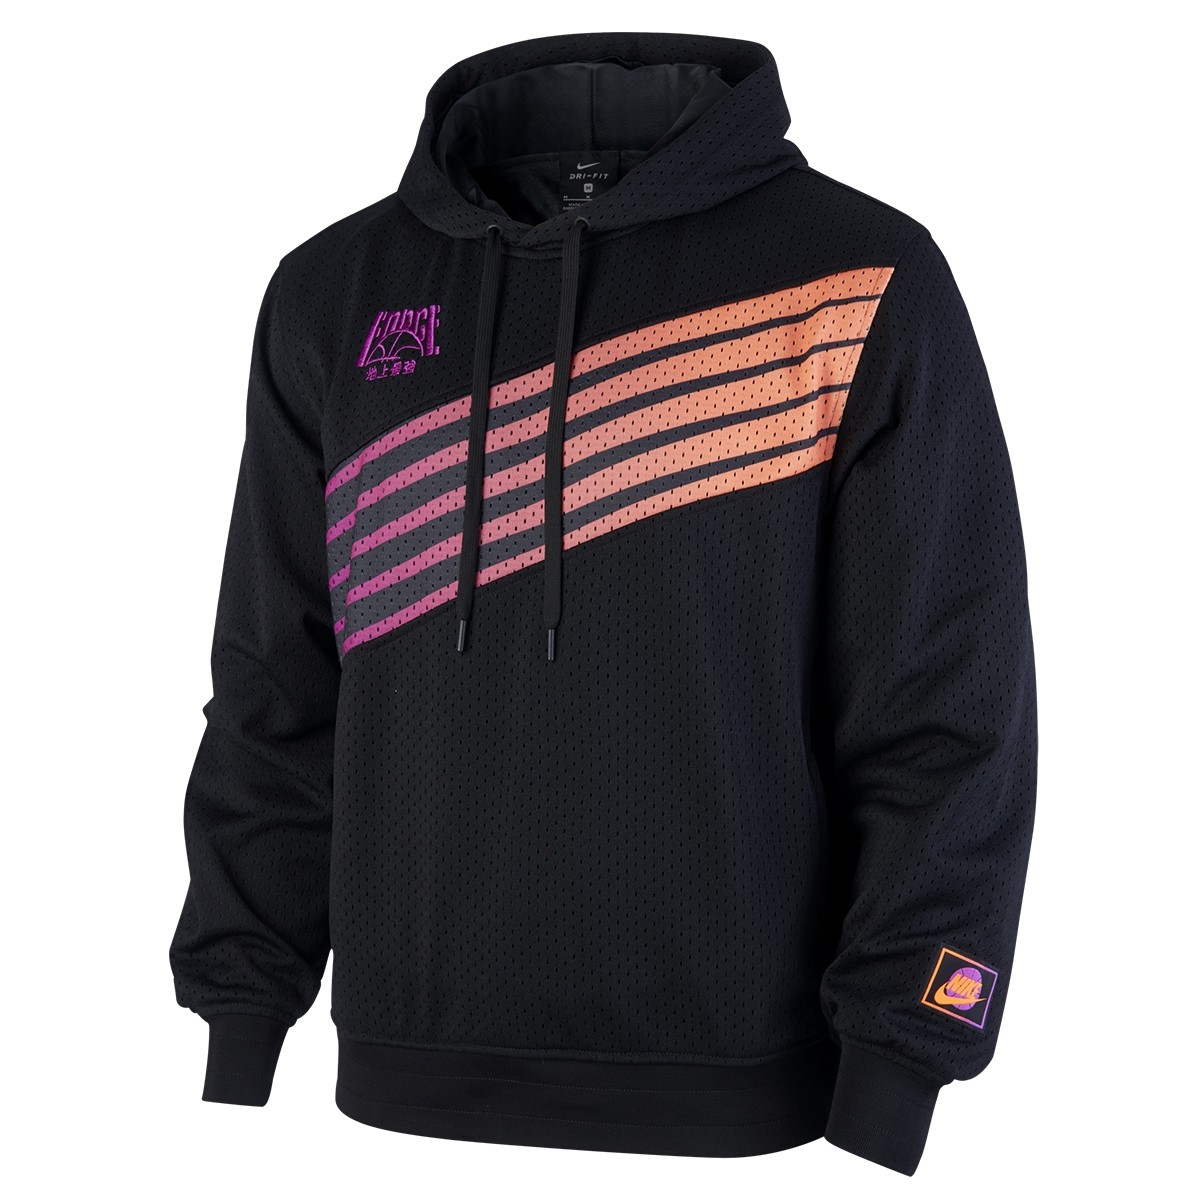 Sudadera Nike KMA 'Black'